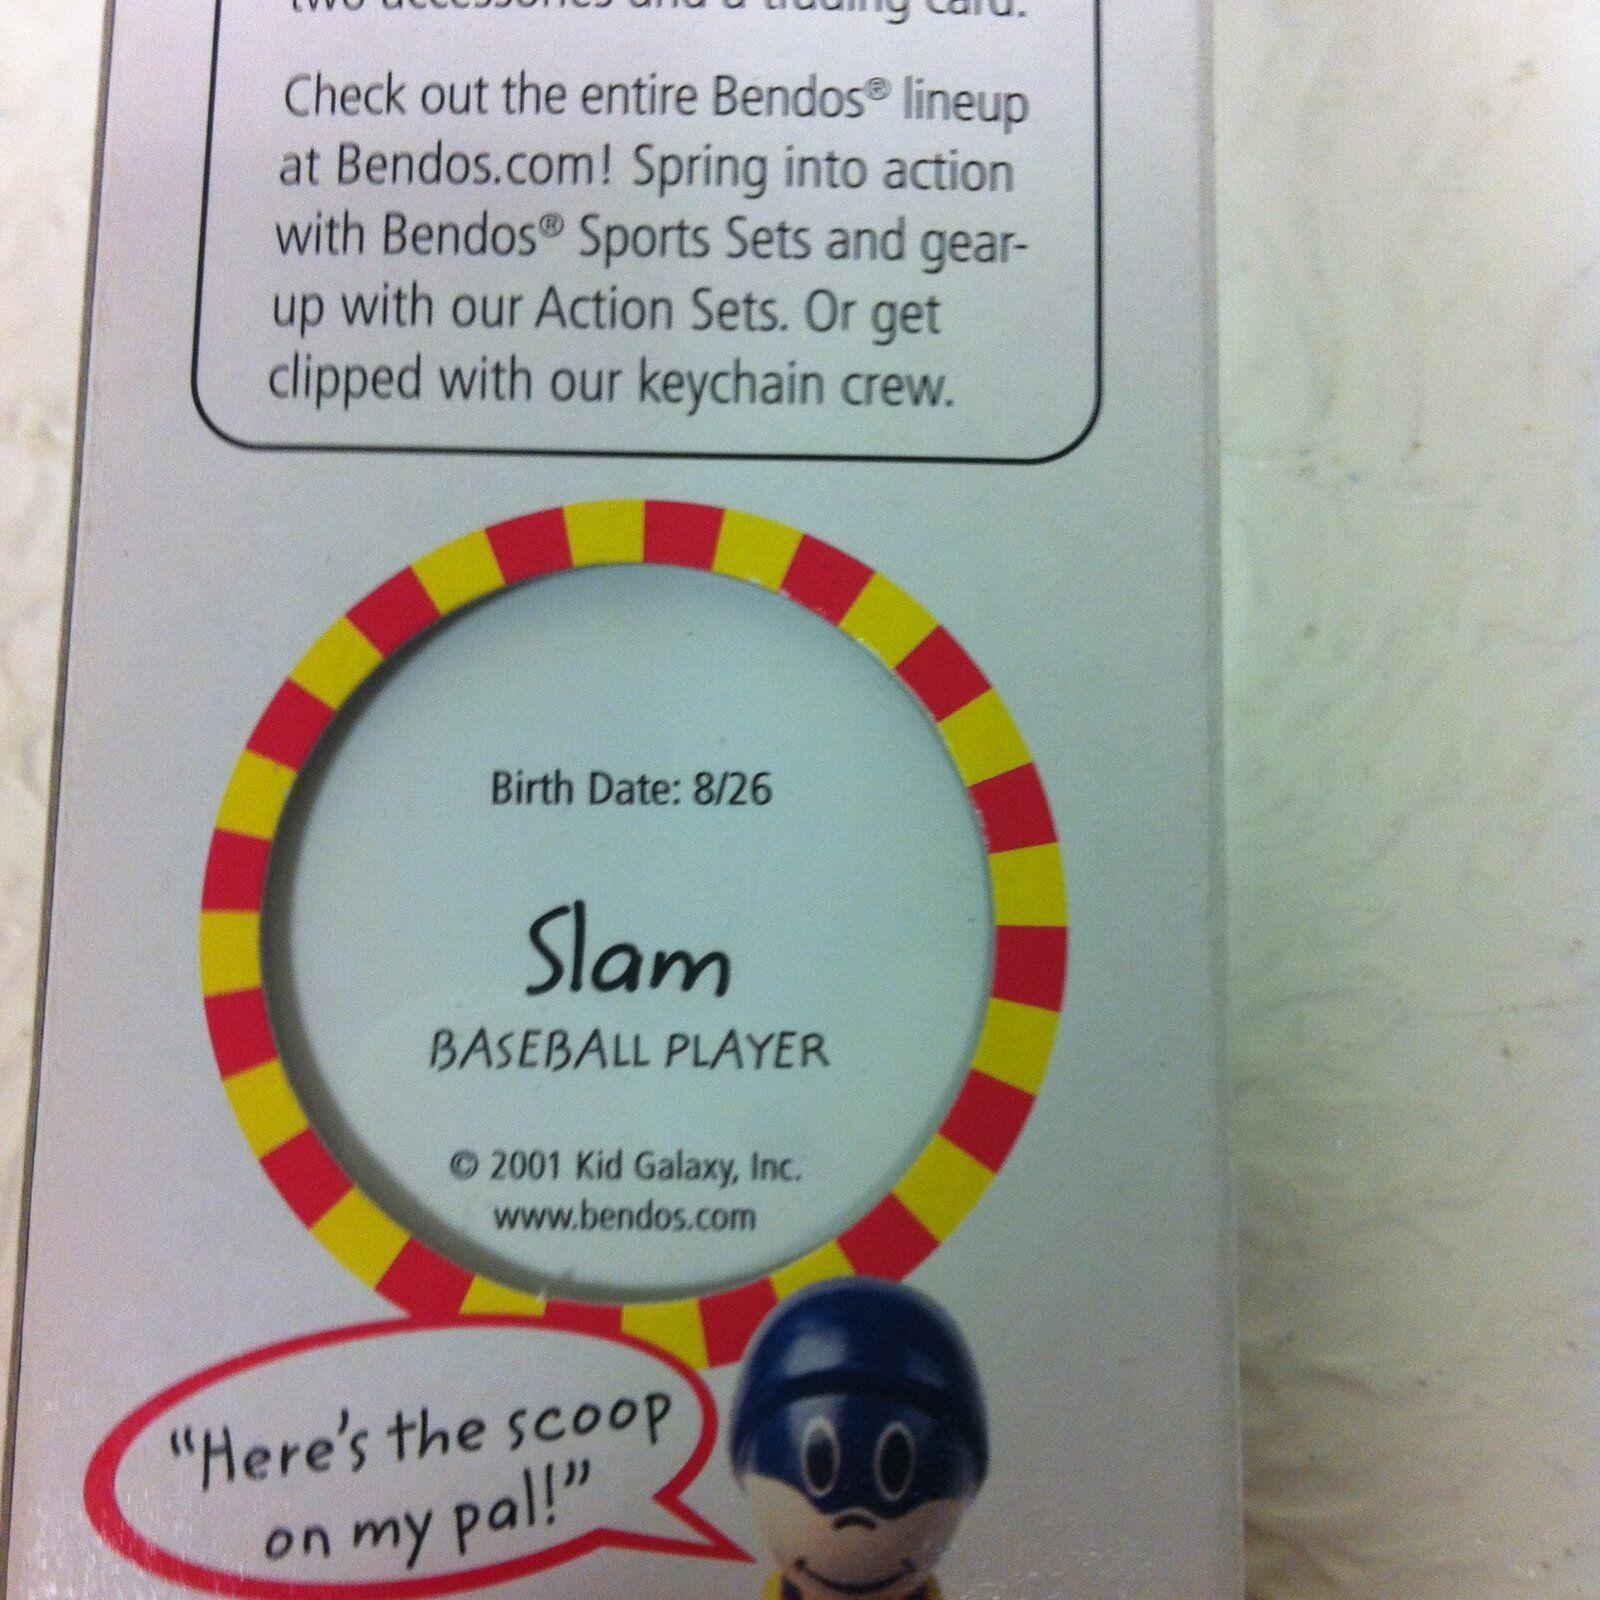 BENDOS SLAM BASEBALL PLAYER 2001 KID GALAXY ACTION FIGURE BRAND NEW IN BOX